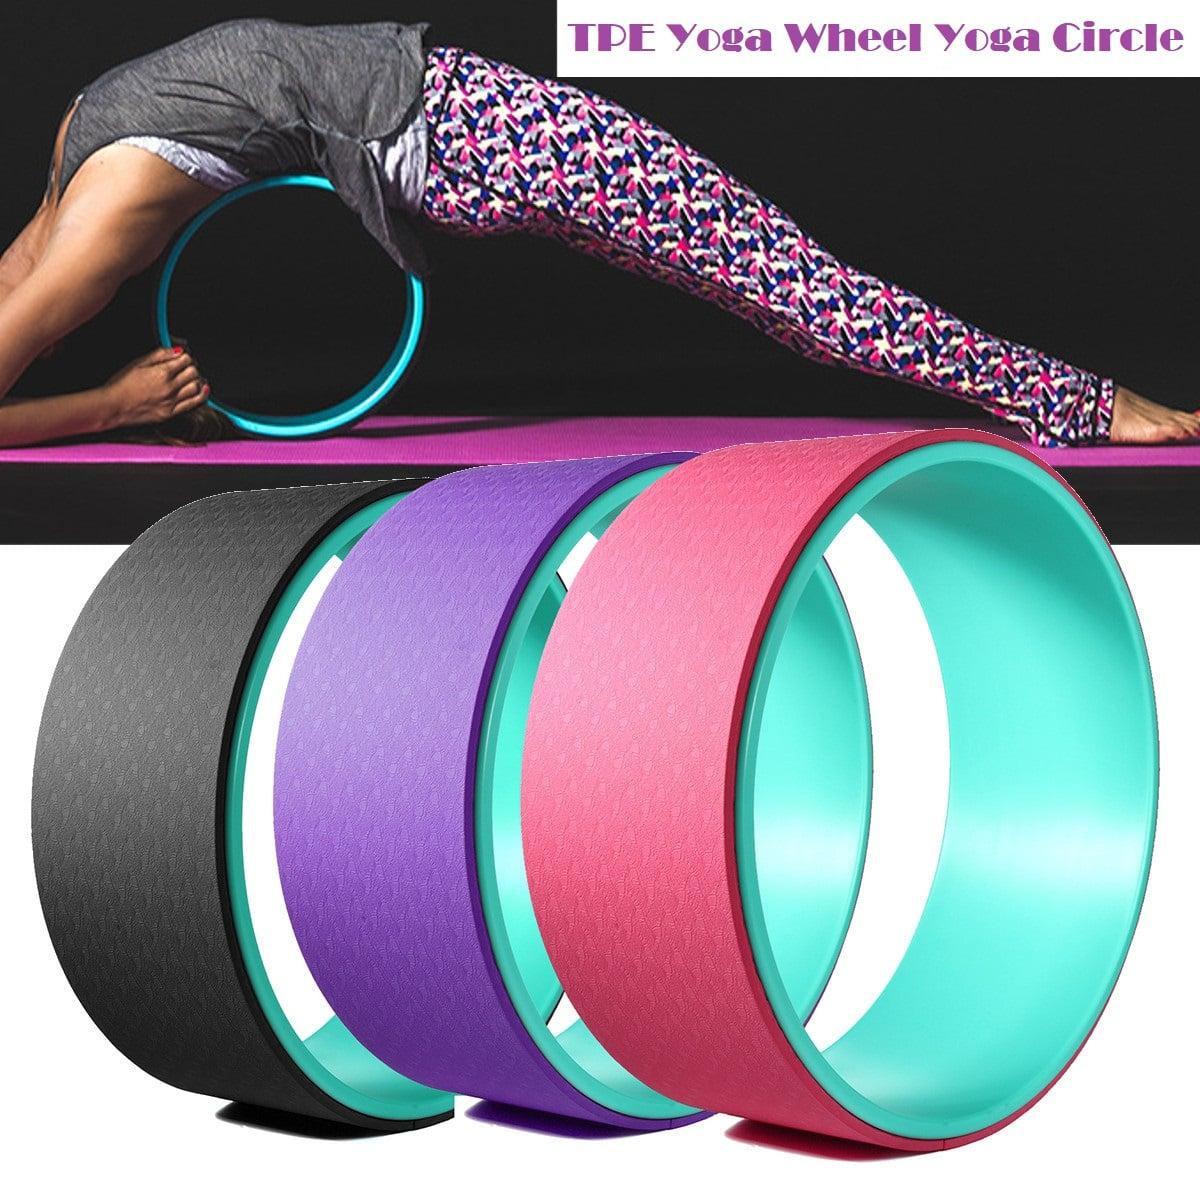 Yoga Wheel Yoga Circle